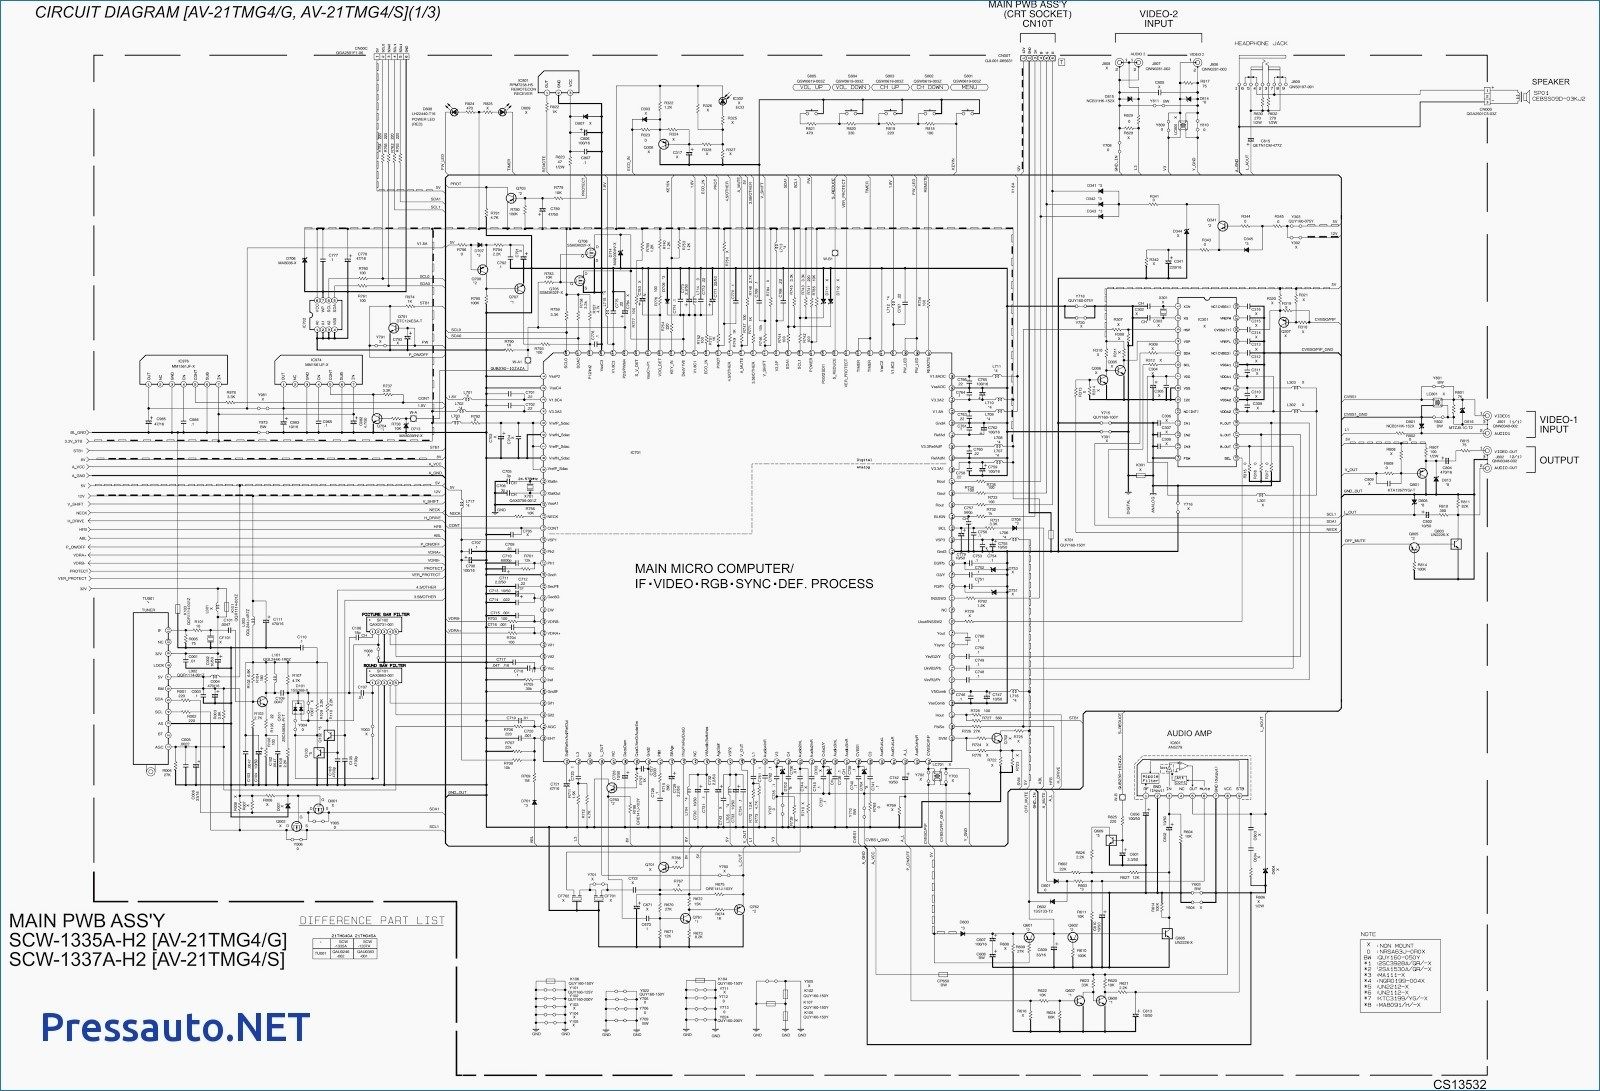 Jvc Kd R Wiring Diagram Luxury Jvc Kd R Of Jvc Kd R Wiring Diagram on Jvc Kd S26 Wiring Diagram